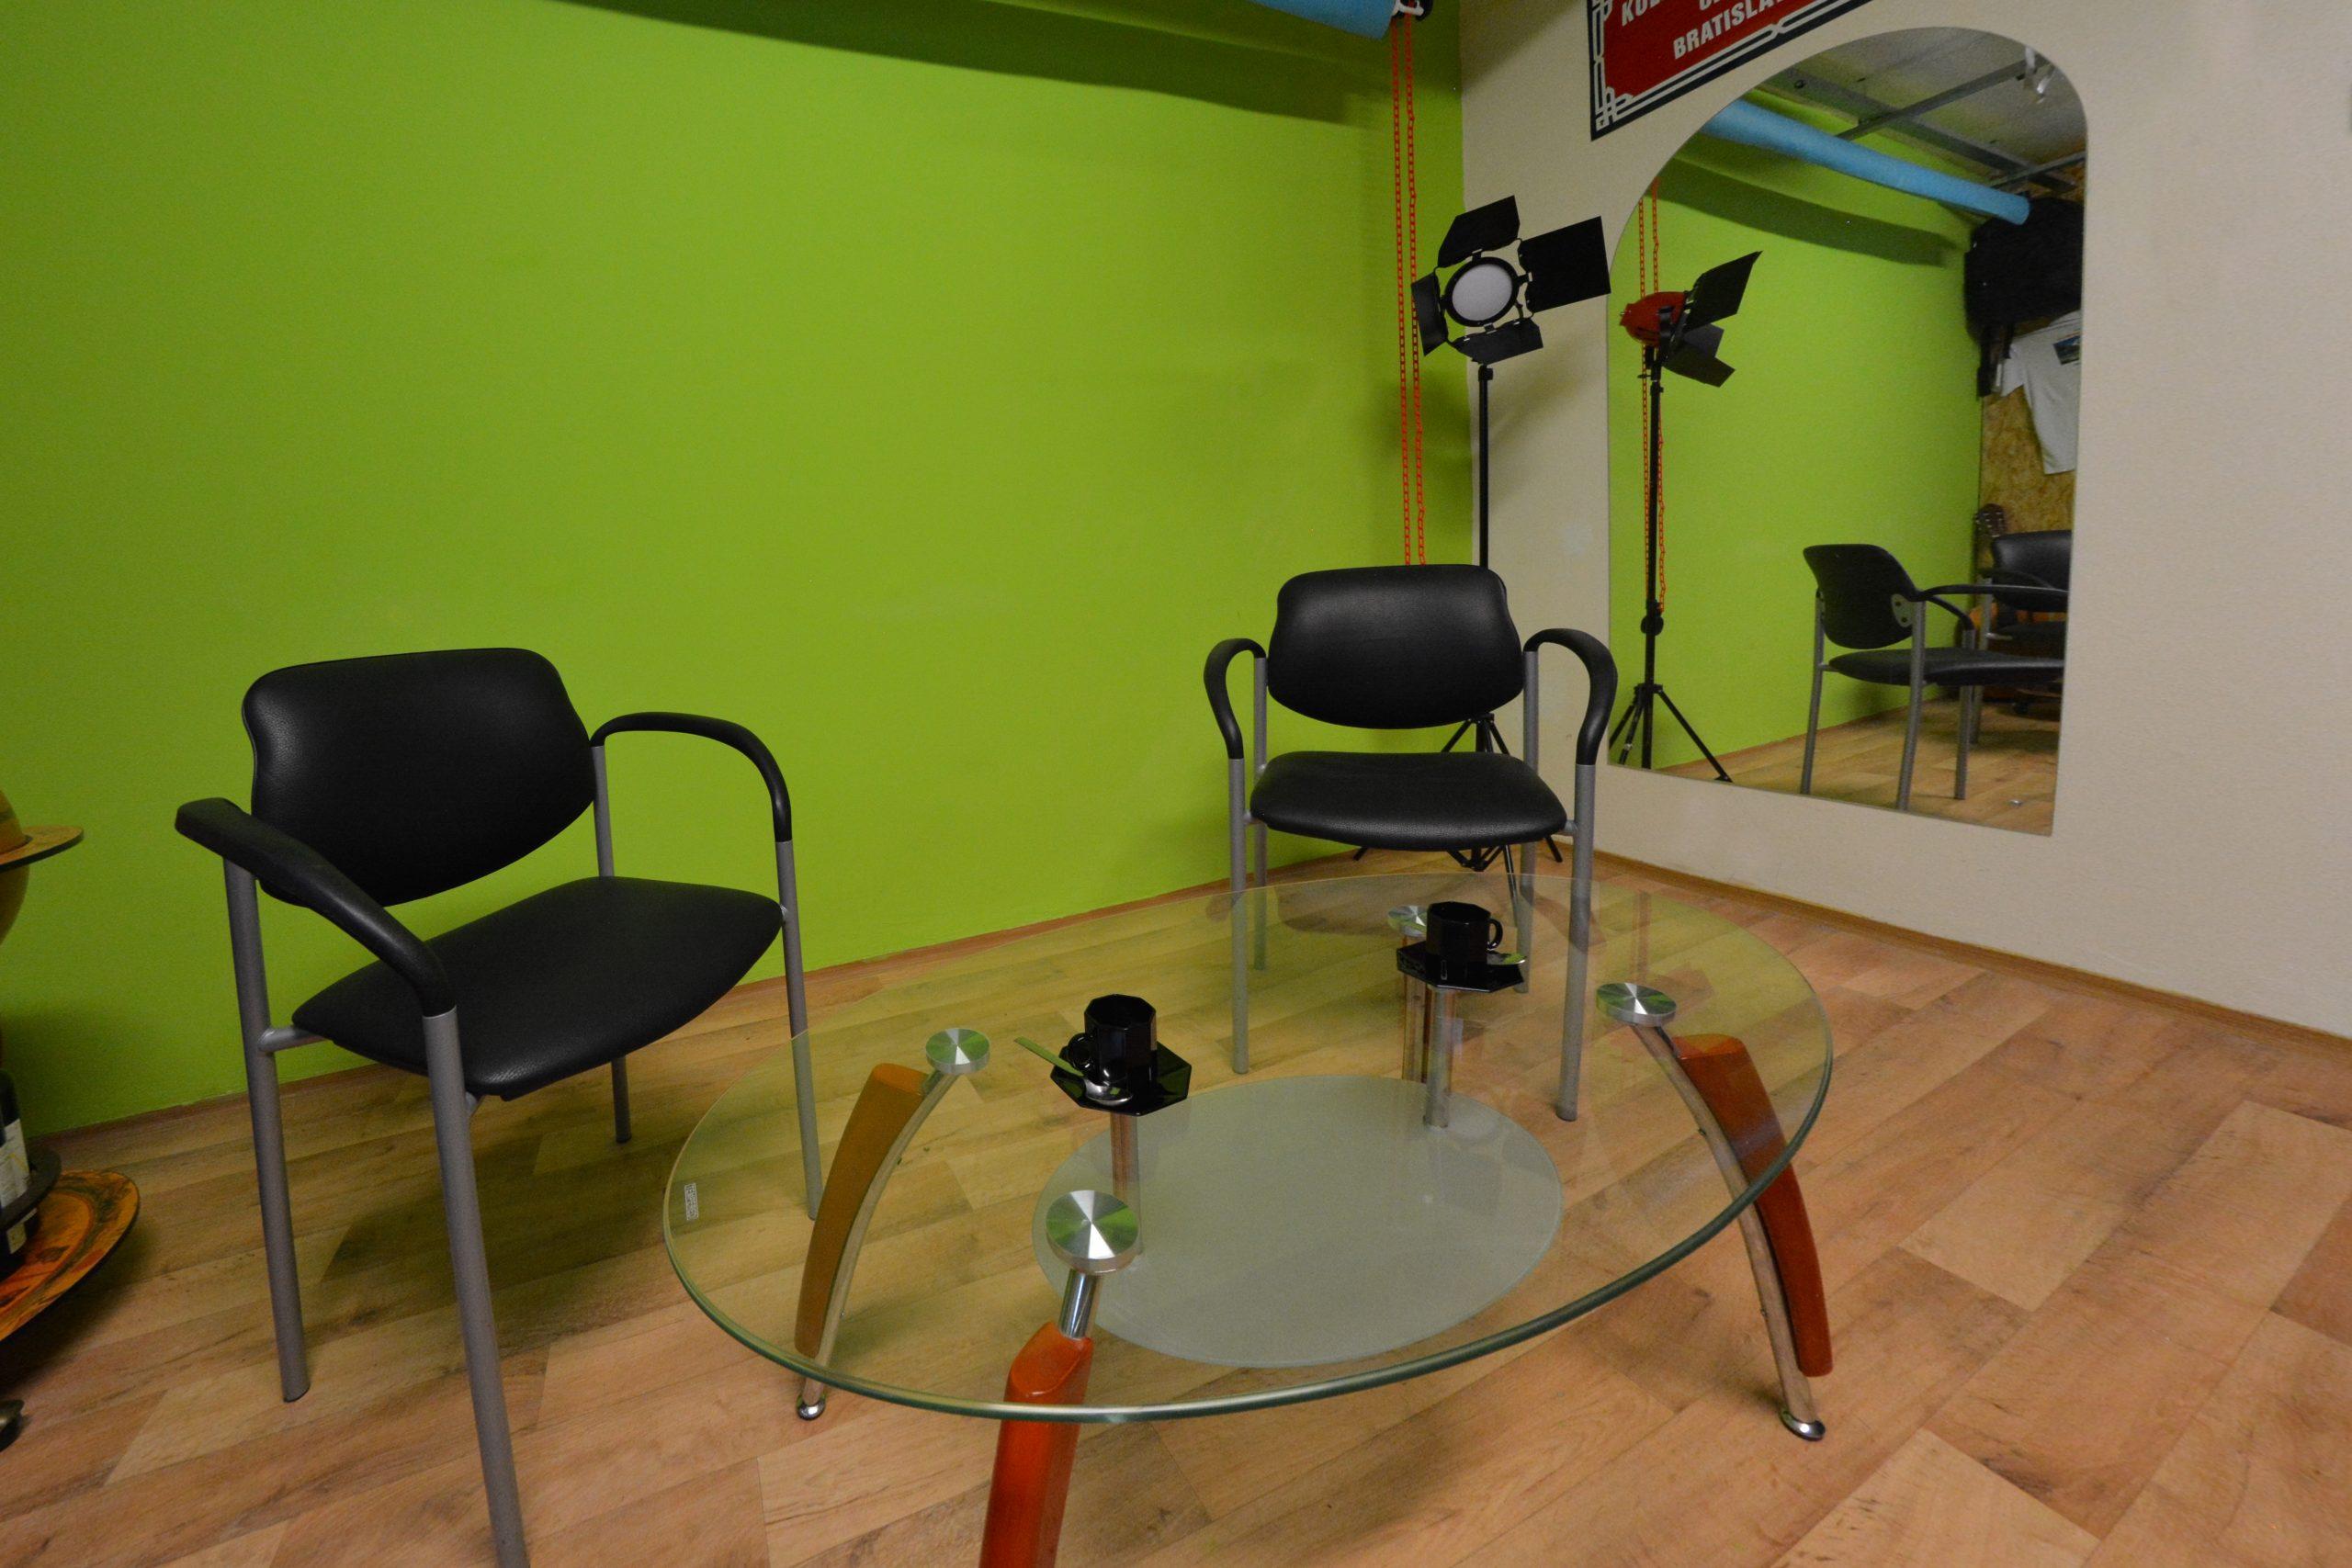 Nahravacie studio